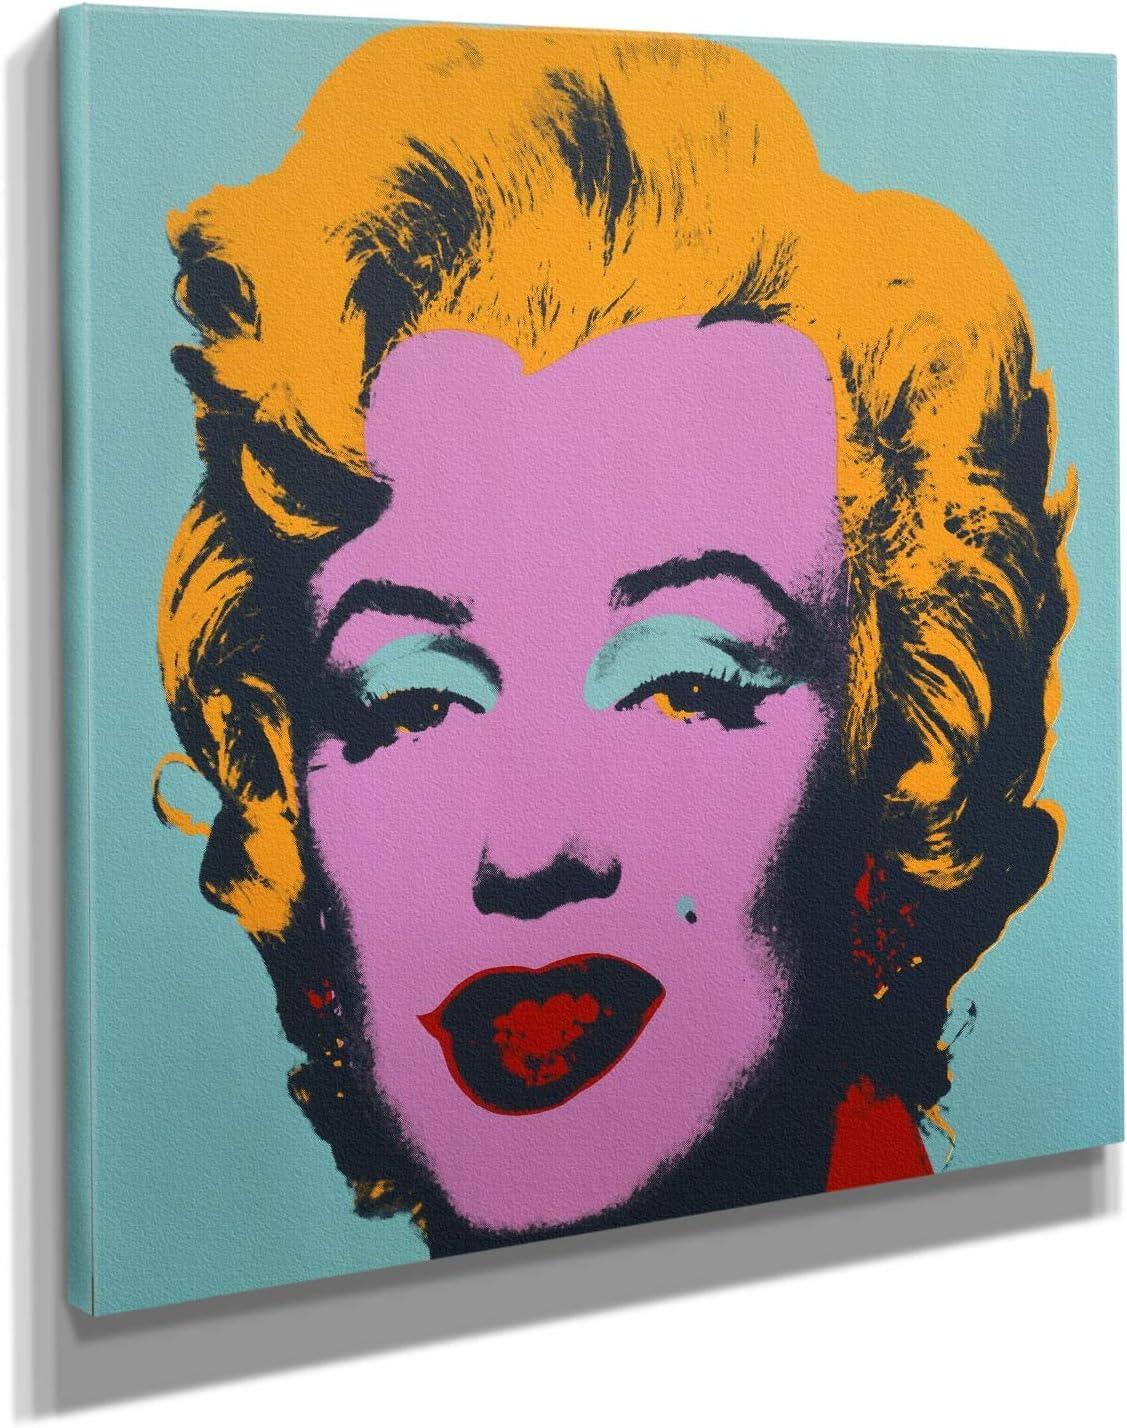 Long Beach Mall Andy Warhol Marilyn Monroe Pop Art Print Canvas Wal latest on Green